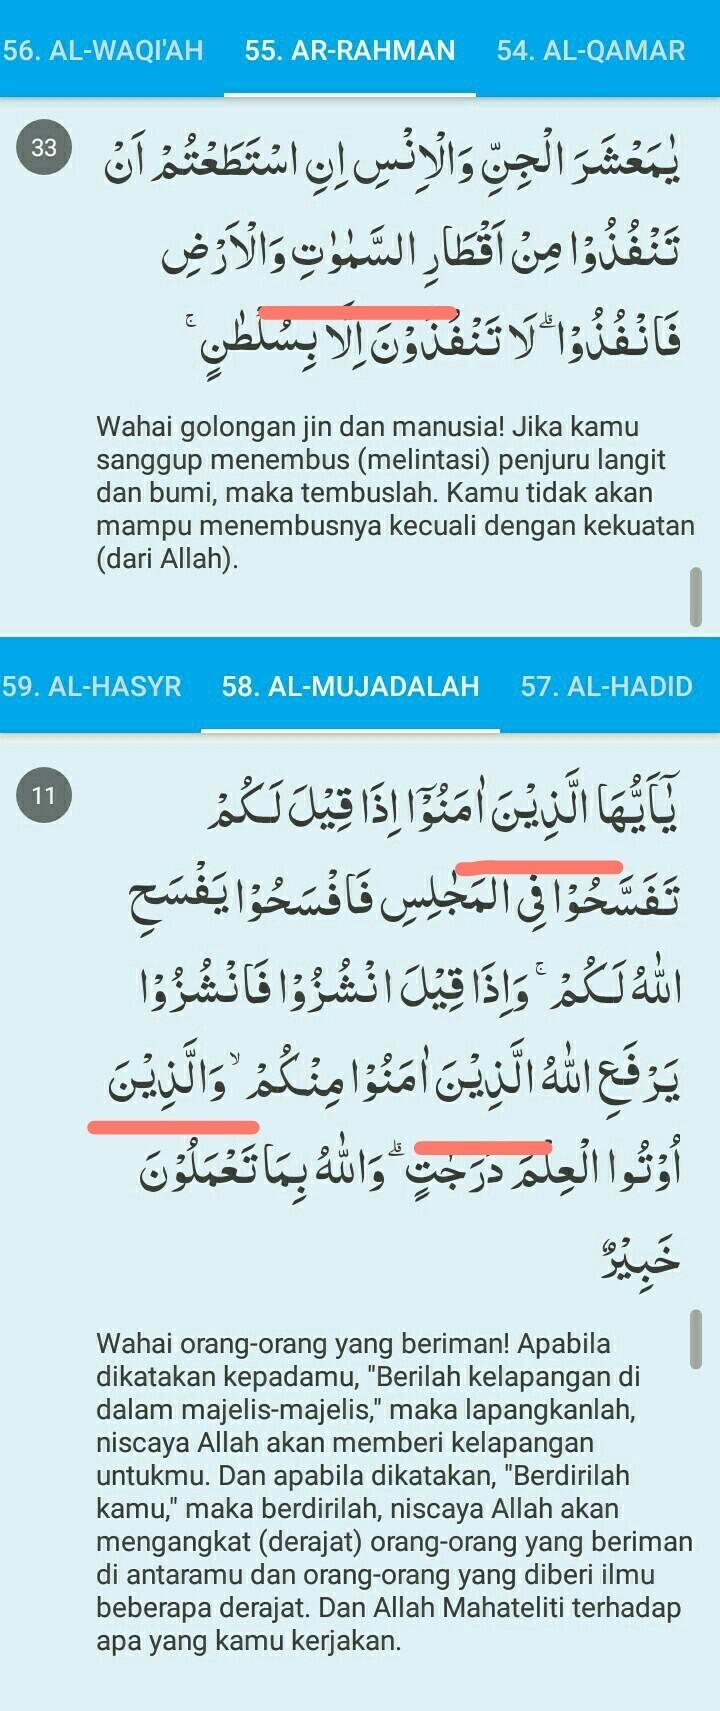 Salinlah Kalimat Pada Surah Ar Rahman Ayat 33 Dan Surah Al